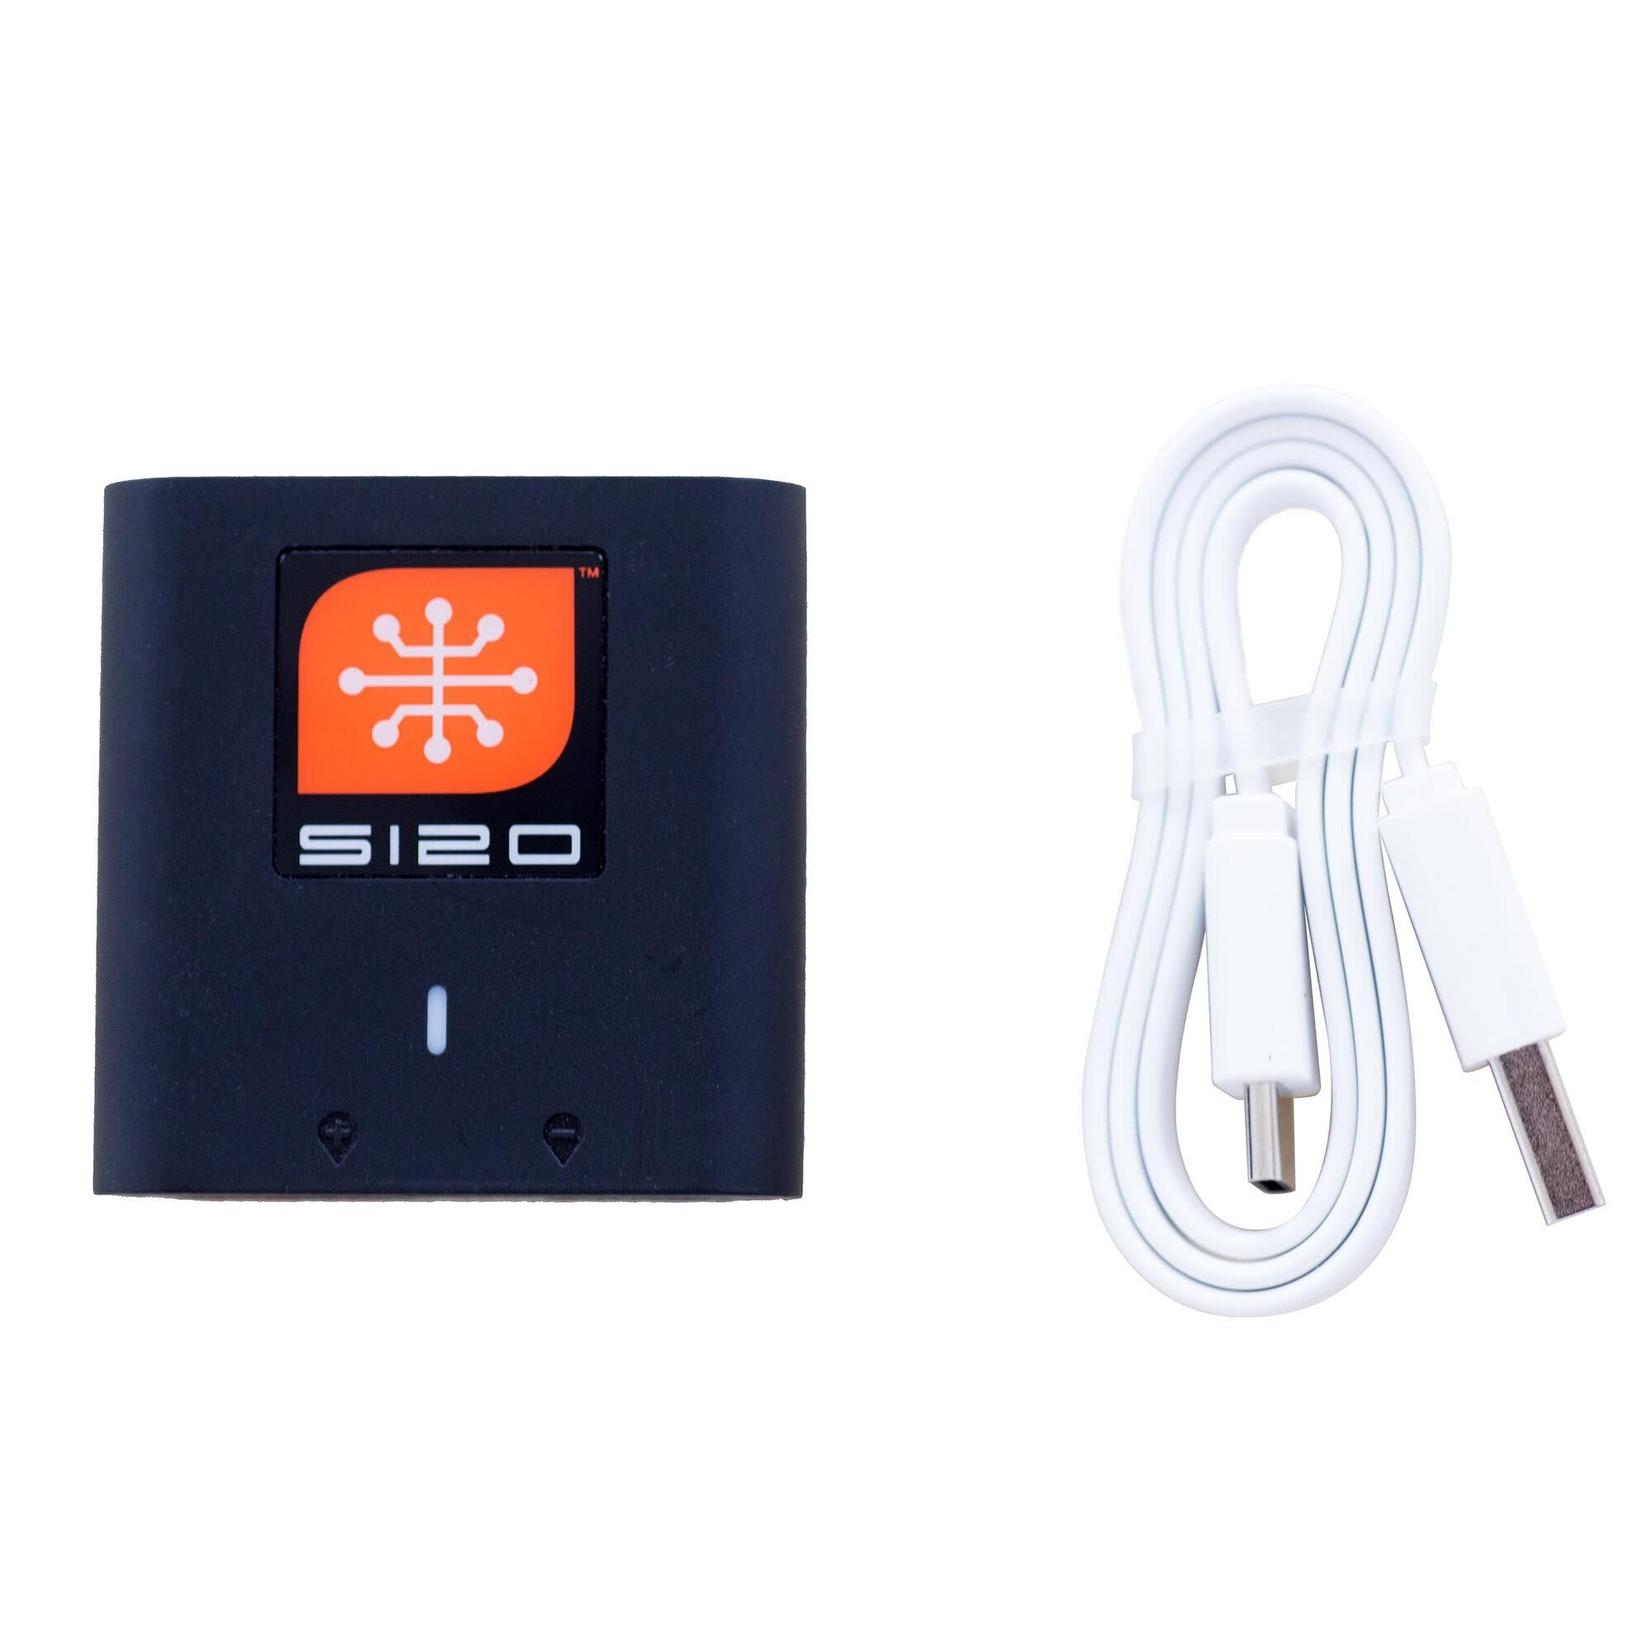 Spektrum SPMXC1020 Spektrum S120 USB-C Smart Charger, 1x20W